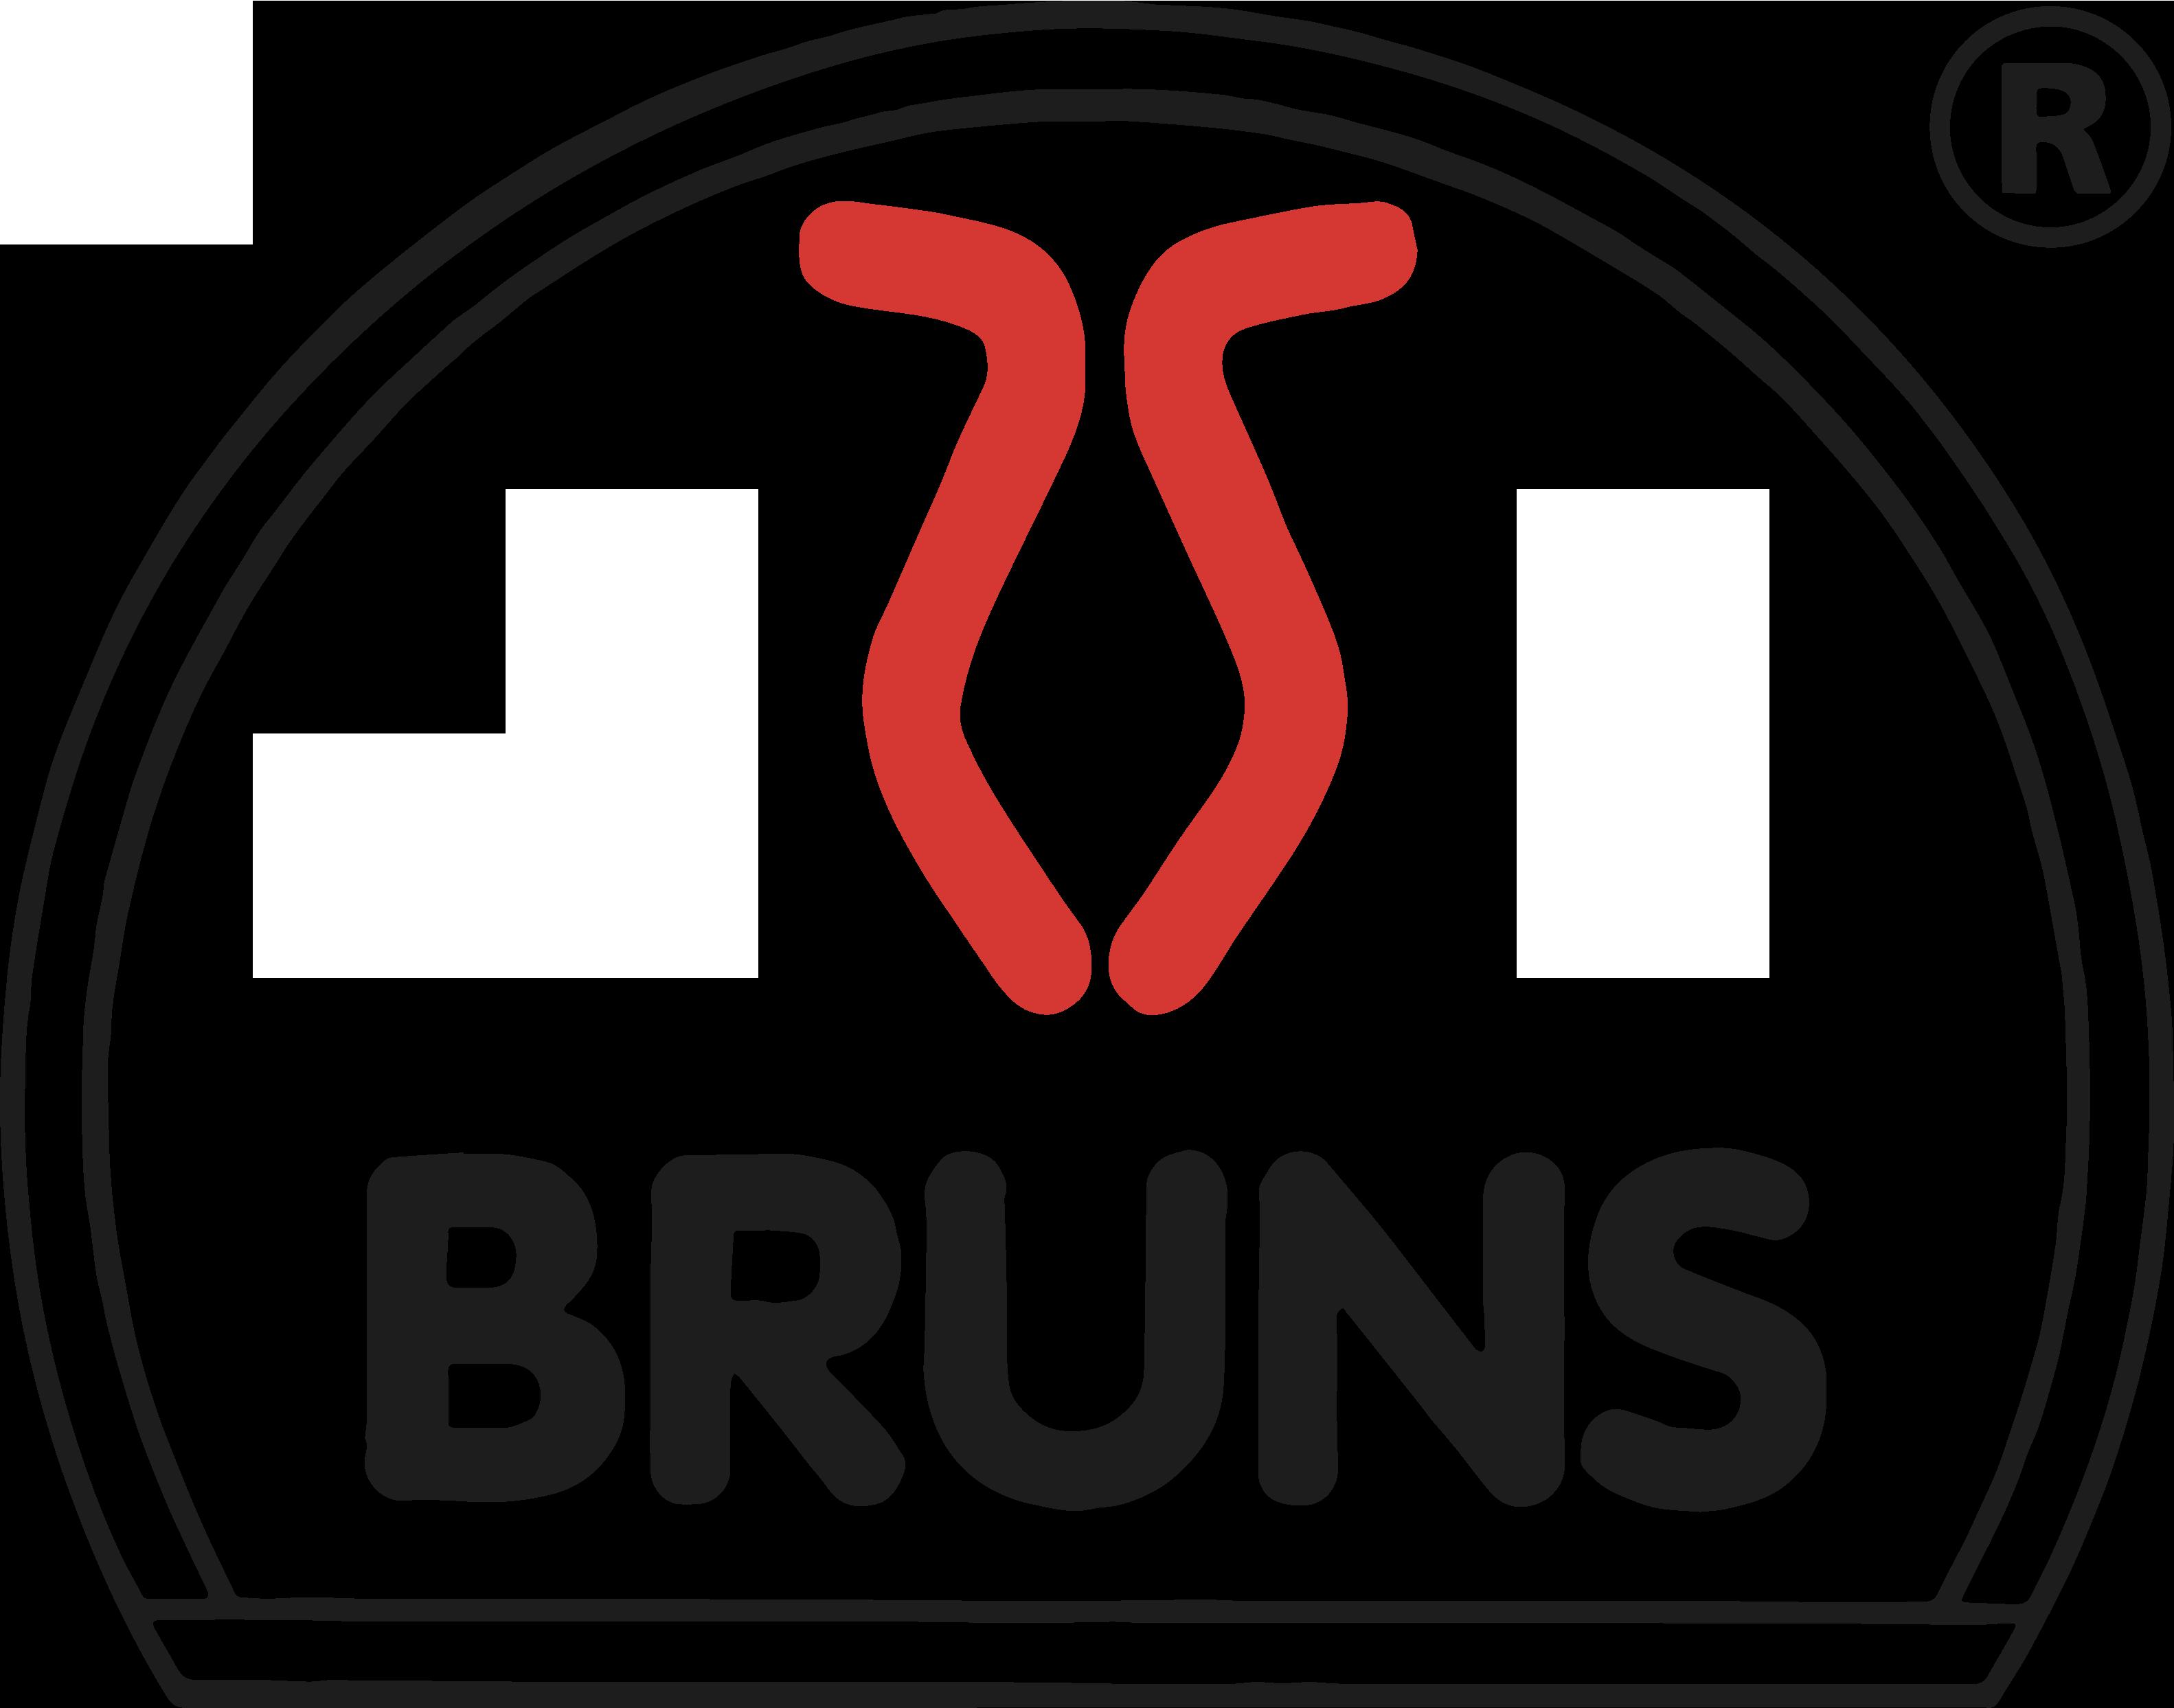 bruns gerätehalter: startseite